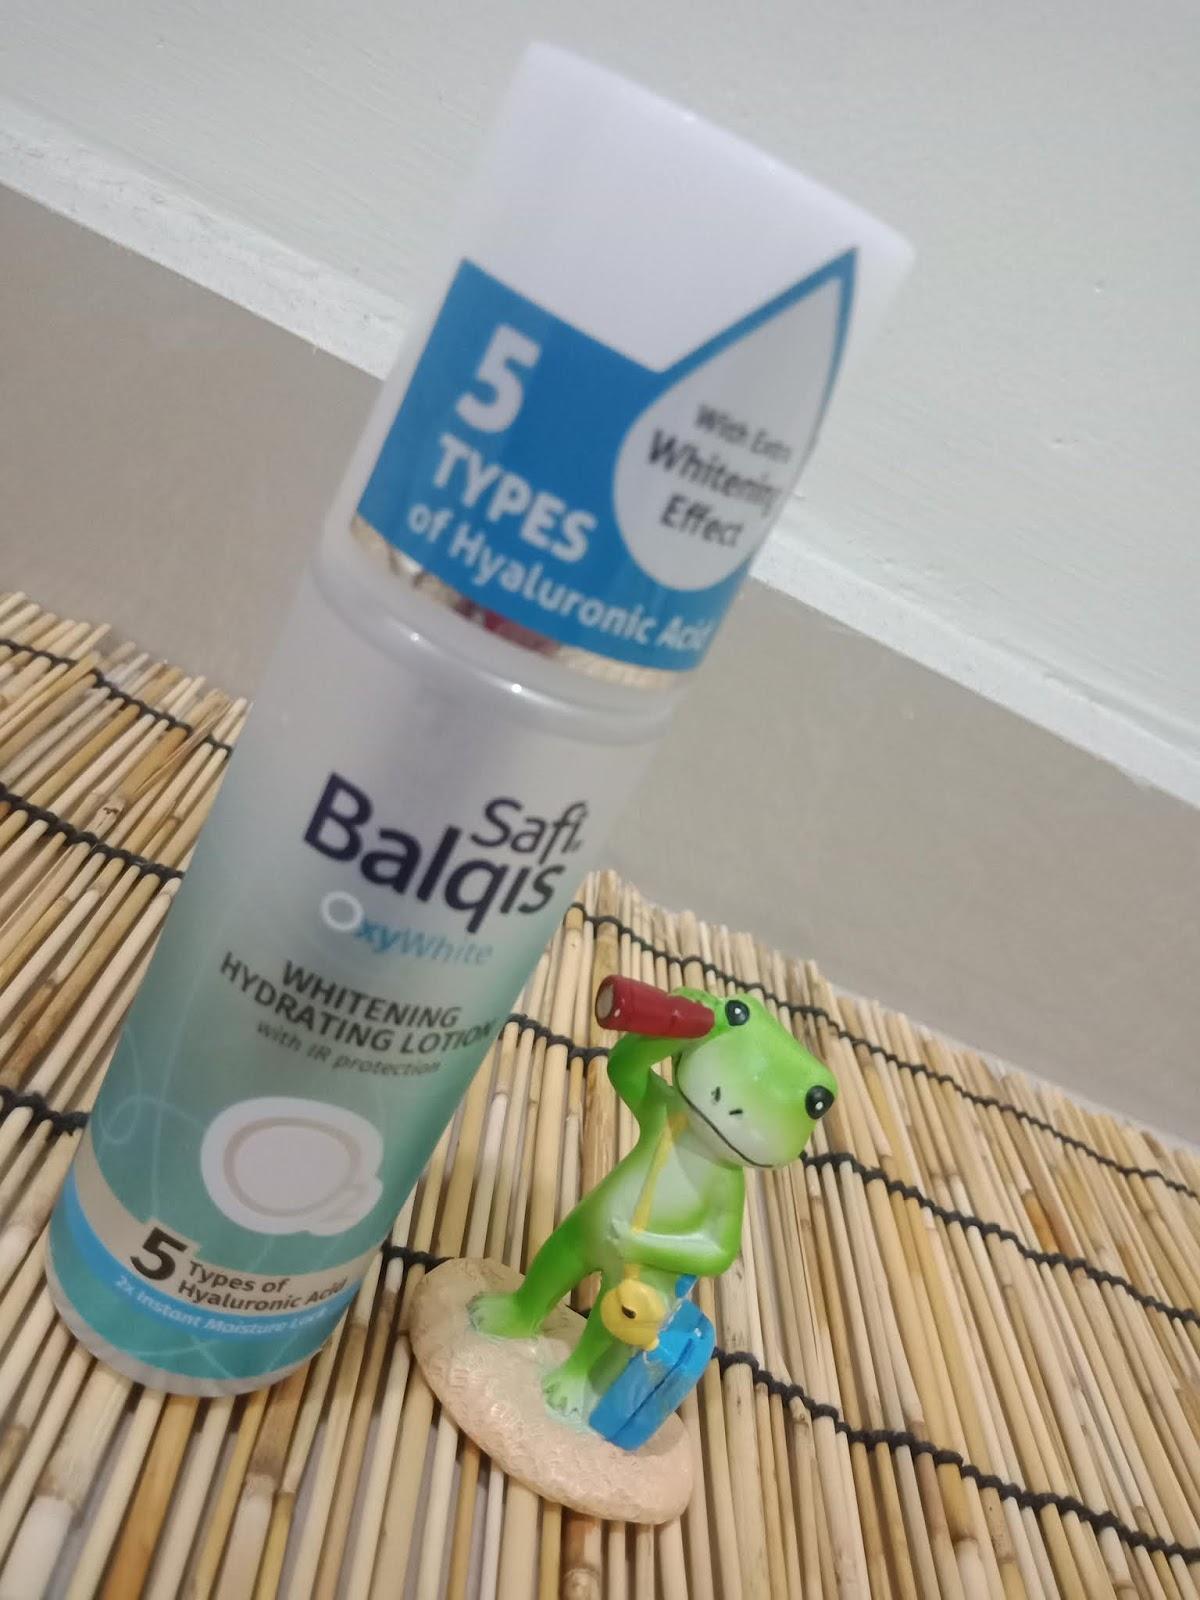 SAFI BALQIS OXYWHITE WHITENING HYDRATING LOTION